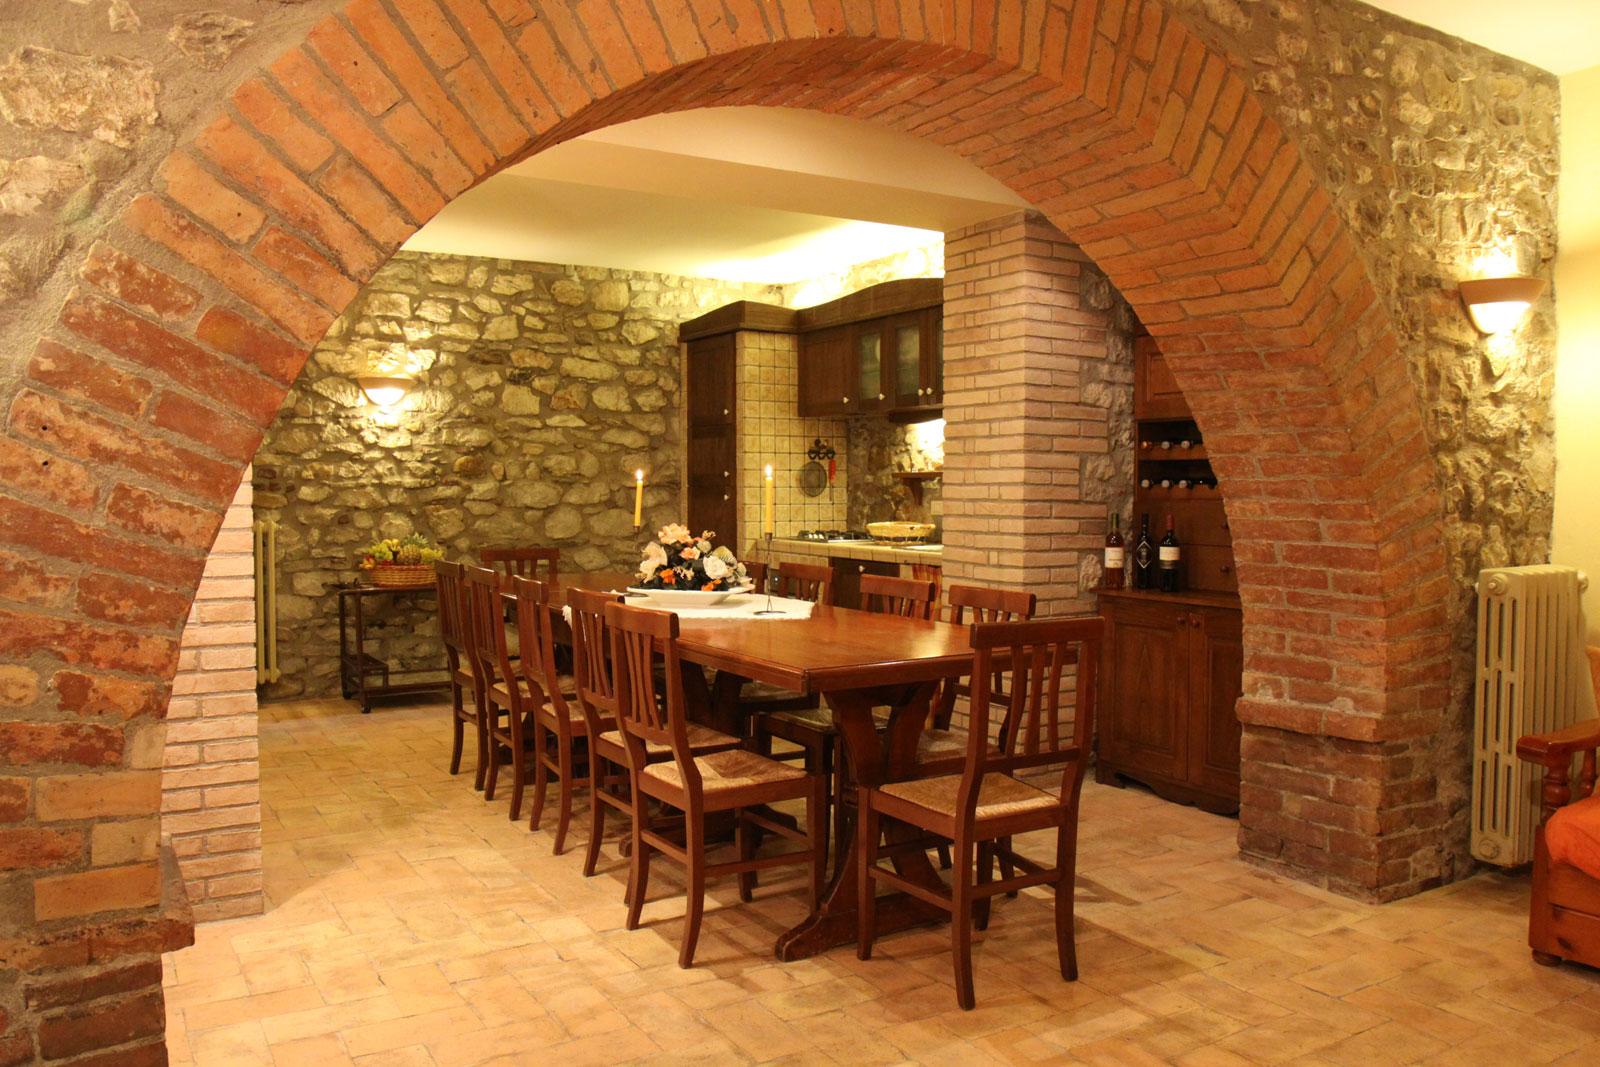 Arredamento taverna rustica with arredare una taverna - Cucina per taverna ...